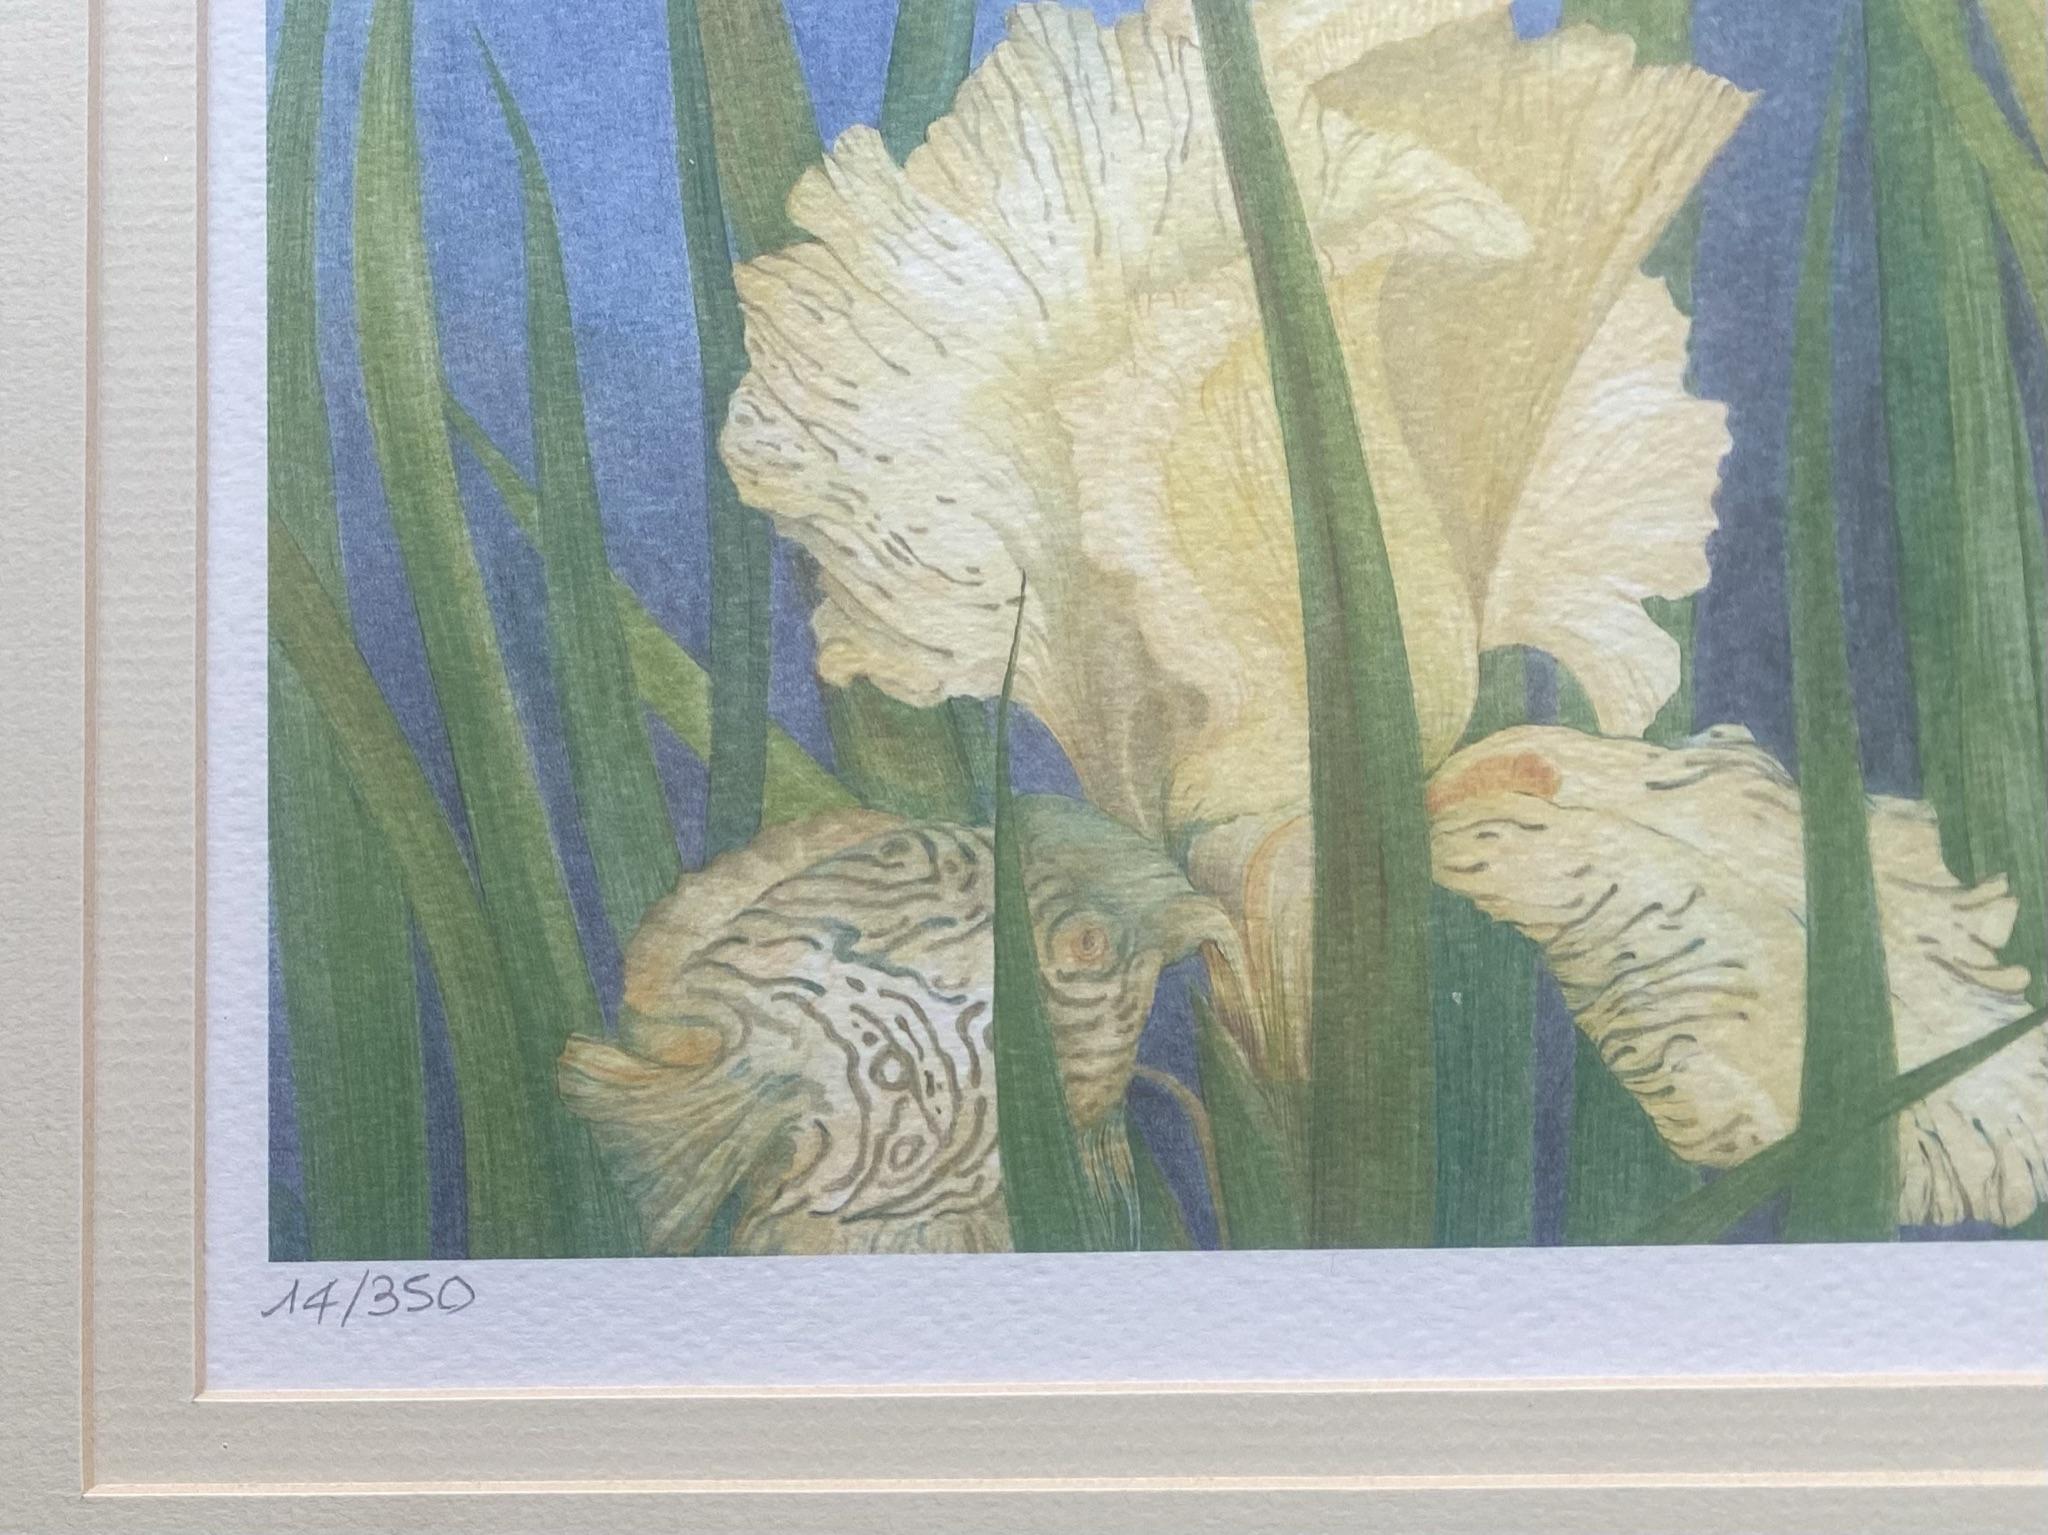 Brigitte Quennehen floral art print Discus - Image 3 of 4